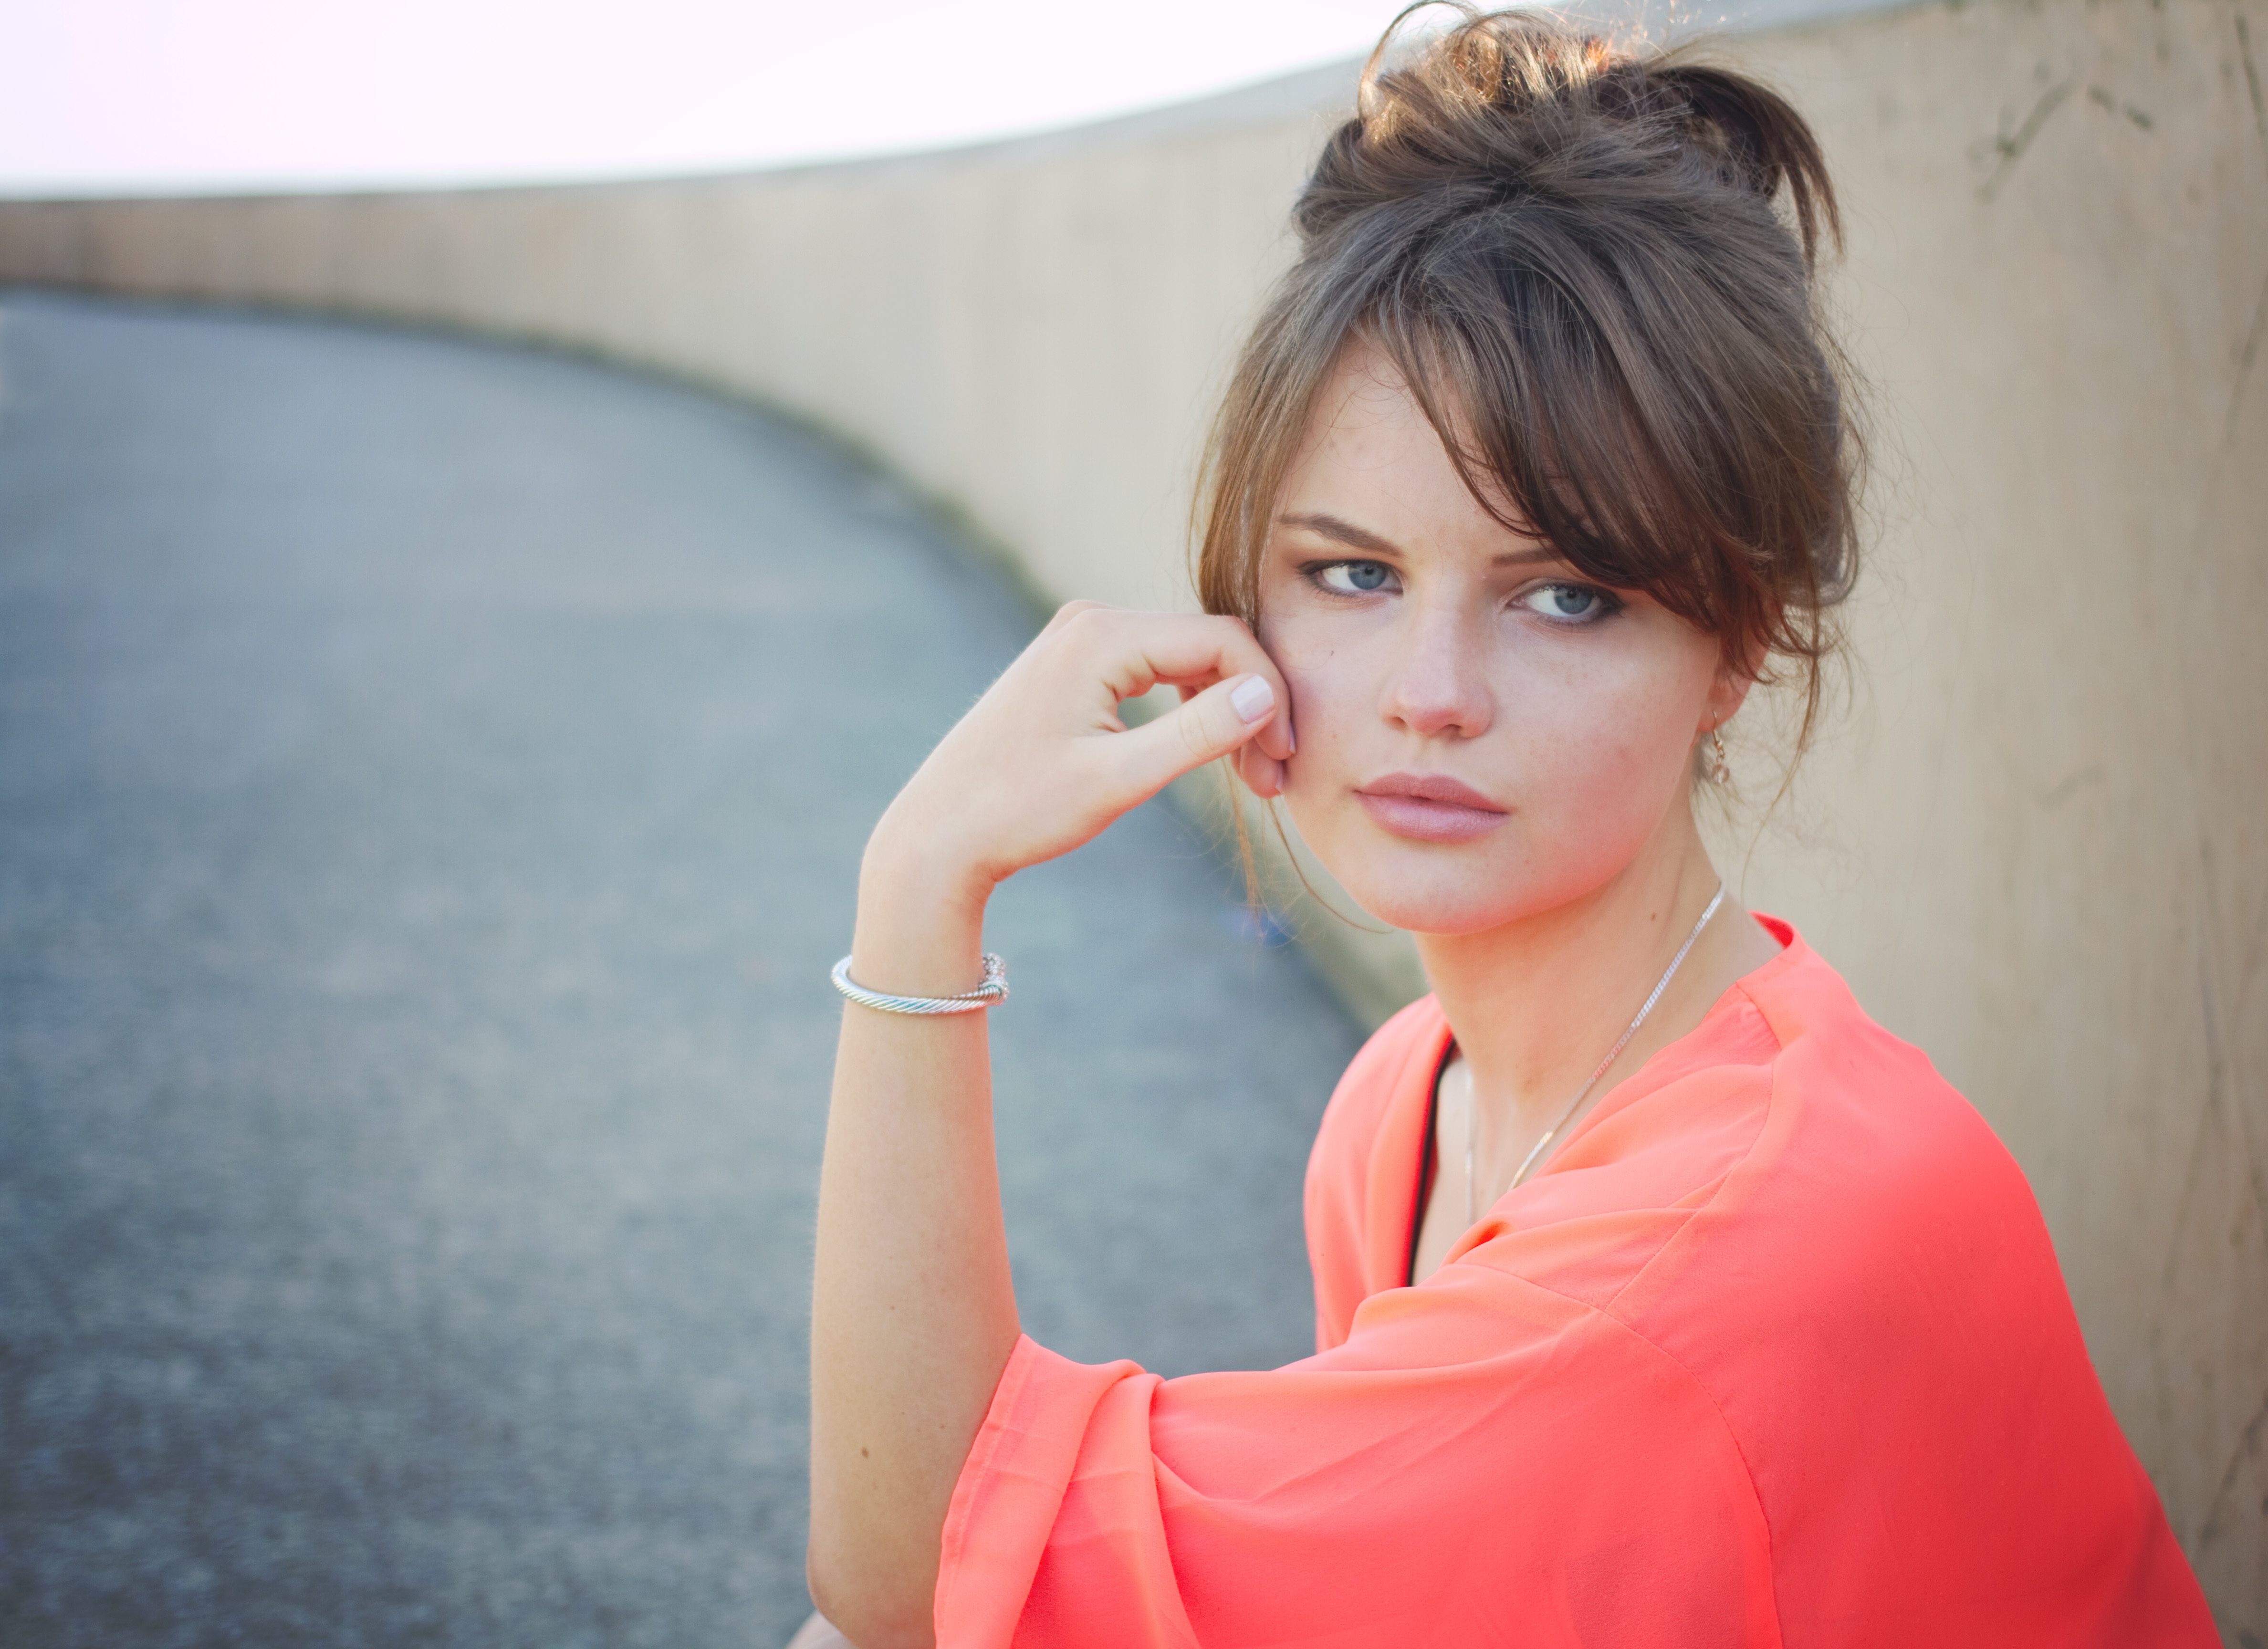 UK teen fashion blogger on beachfront wearing coral pink kimono